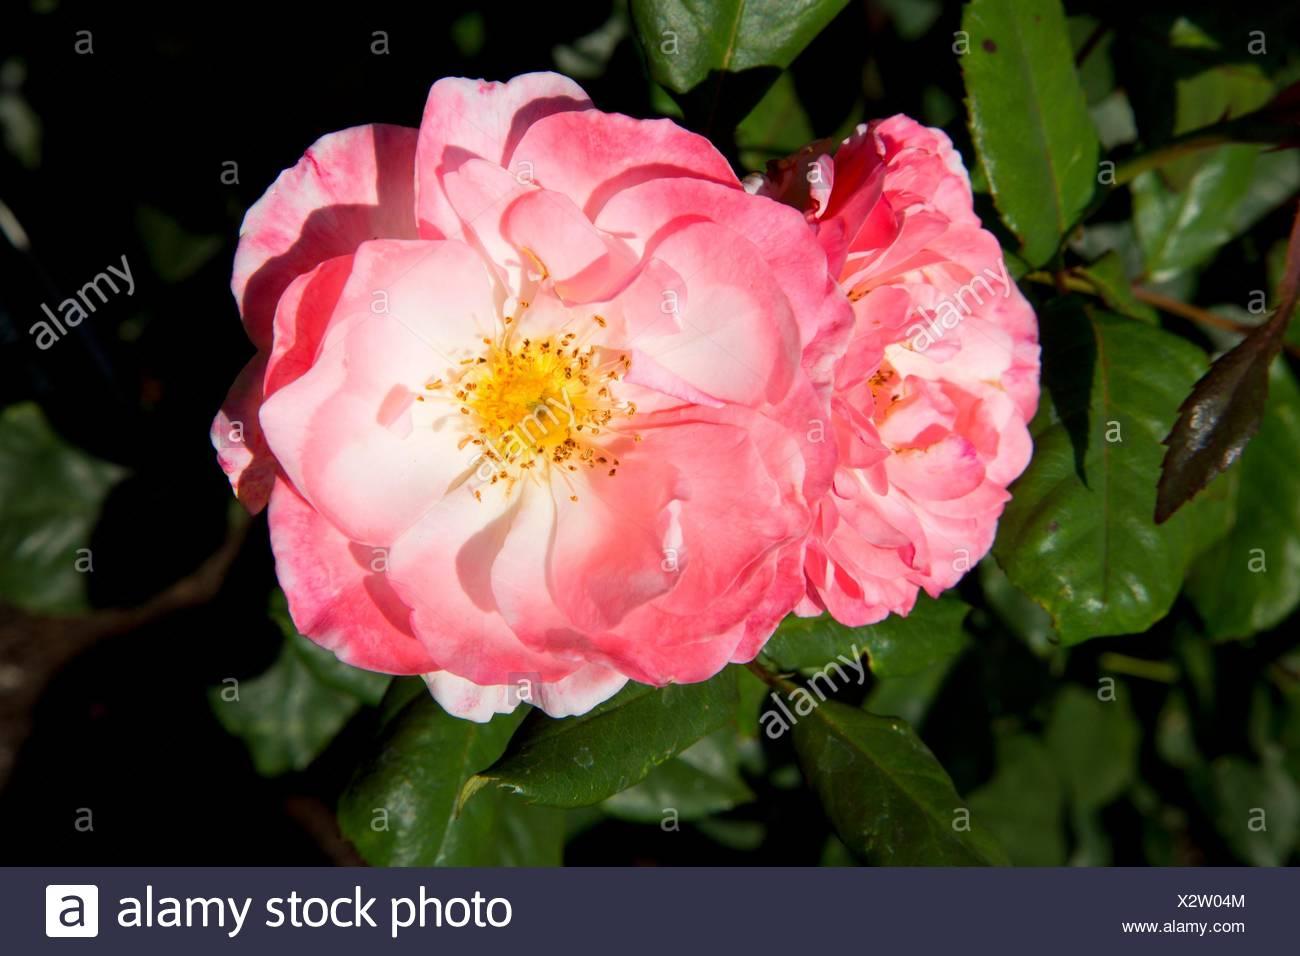 English Miss rose, Heirloom Roses, St Paul, Oregon. - Stock Image